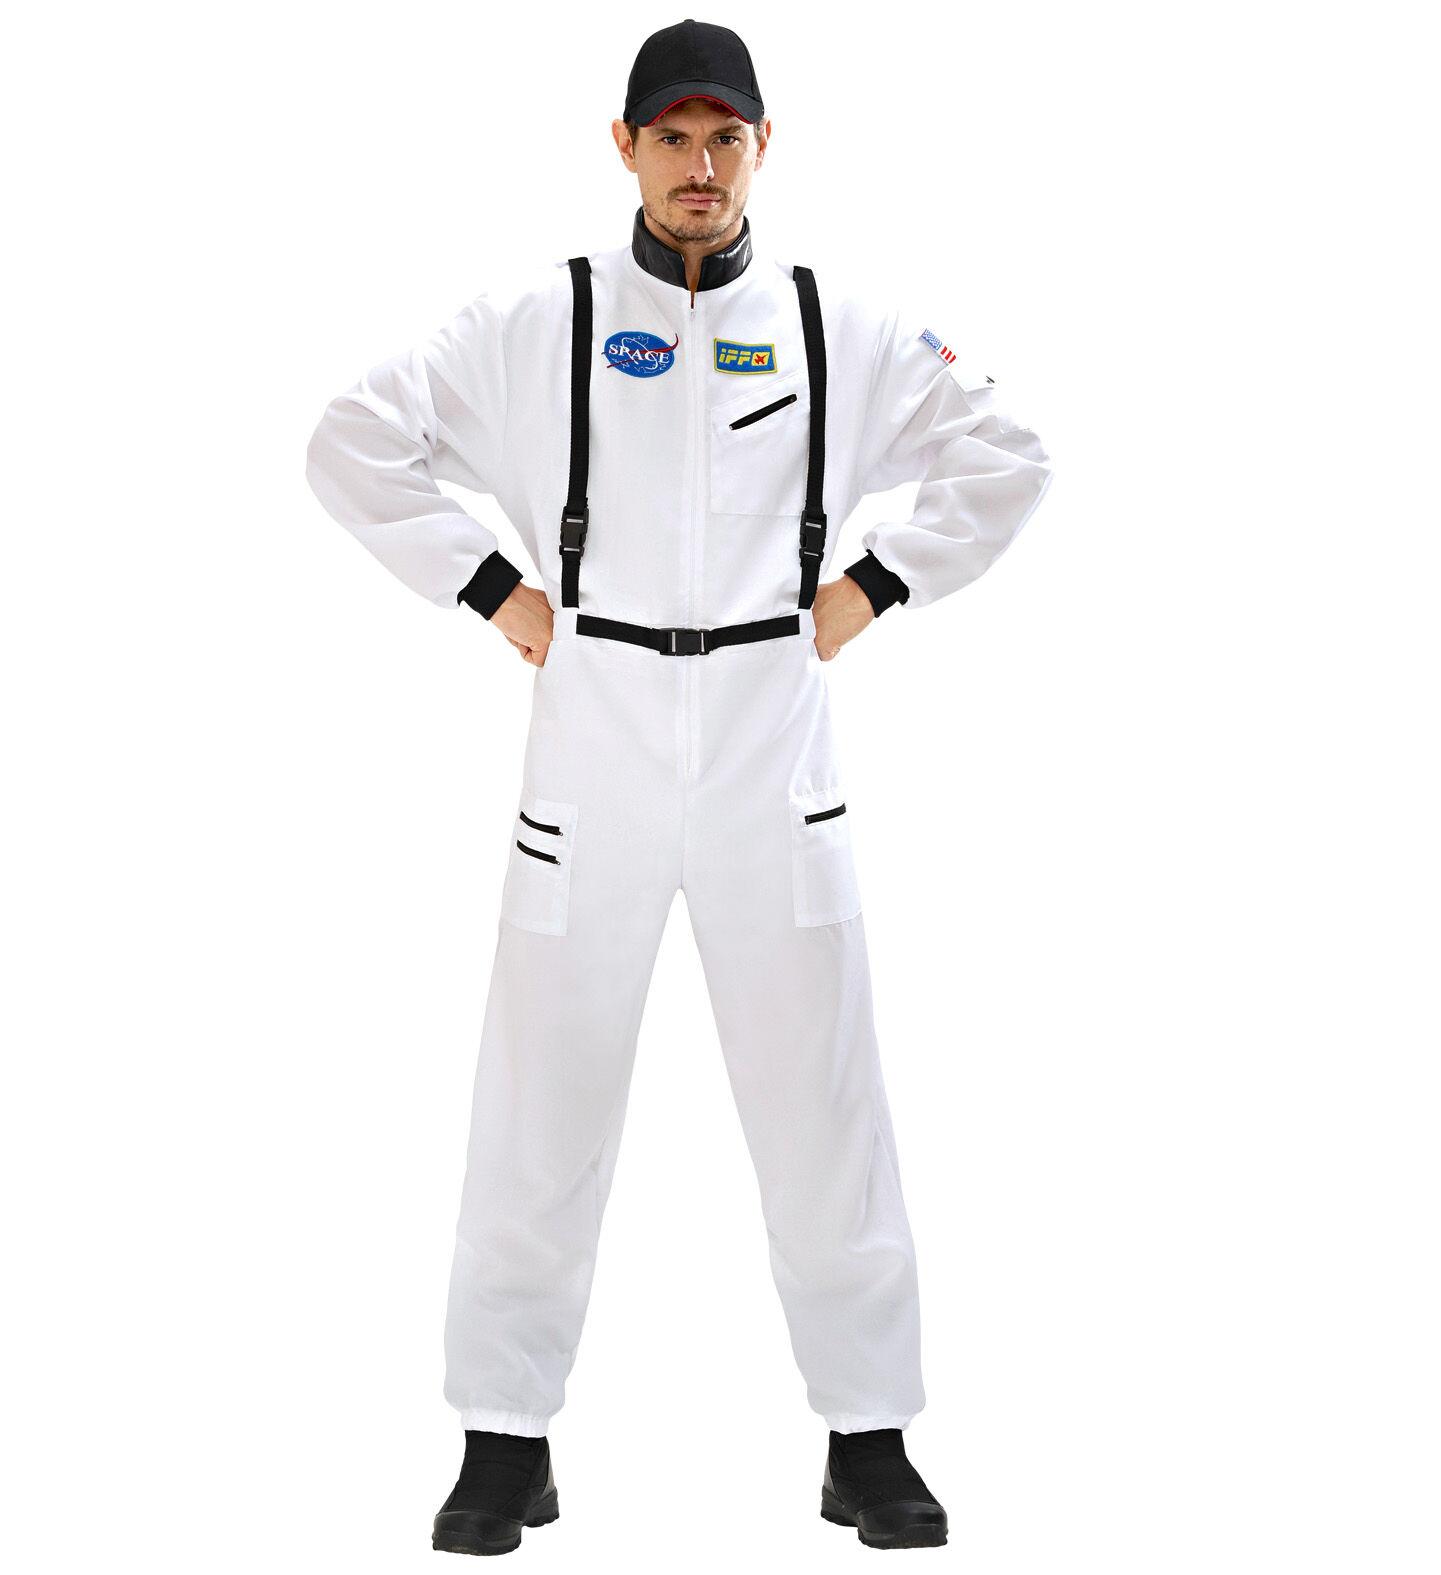 WIDMANN S.R.L. Tuta Uomo Astronauta Americano Nasa Carnevale